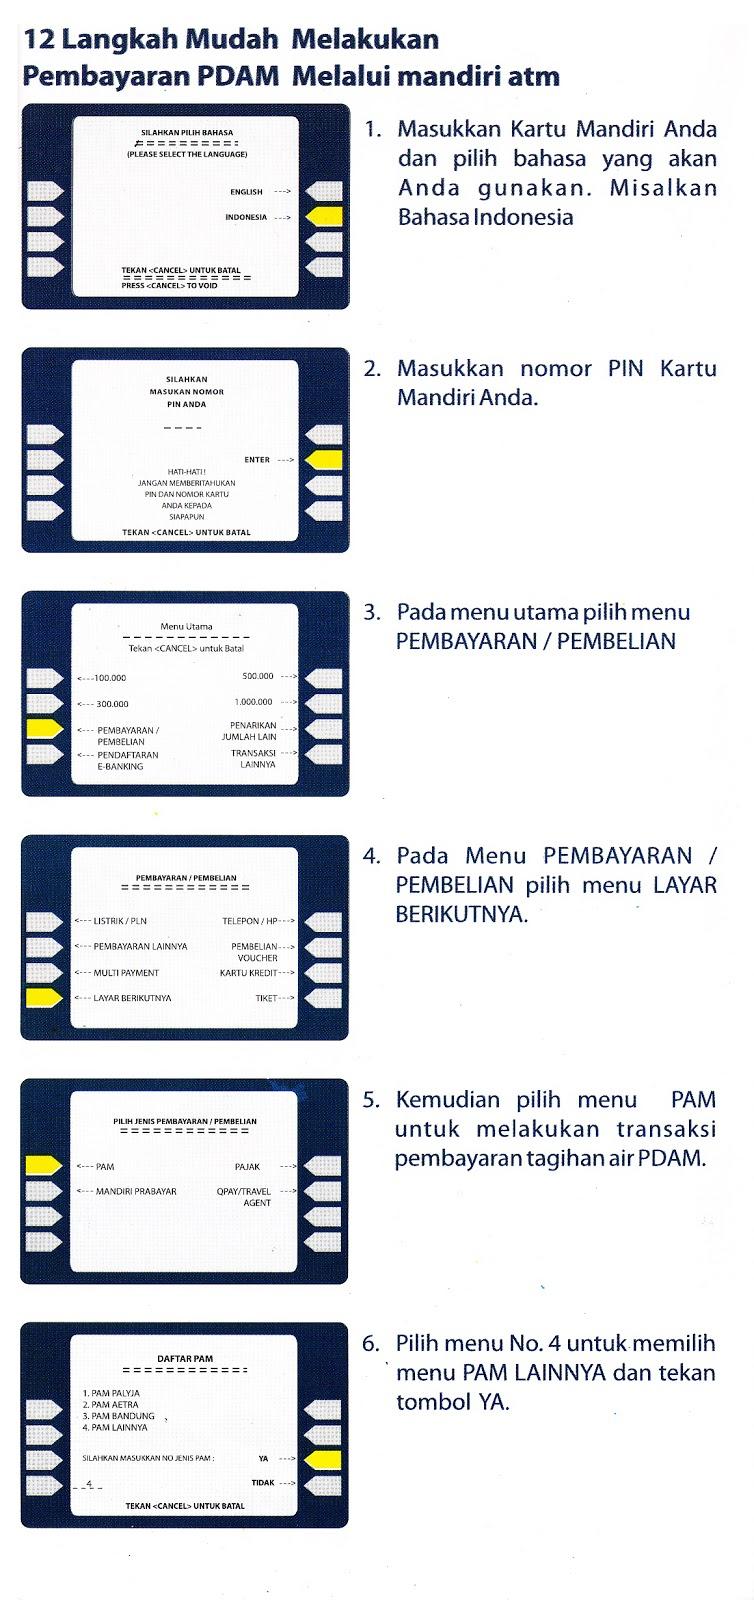 Cara_Bayar_Tagihan_PDAM_Kota_Surabaya_via_ATM_Bank_Mandiri